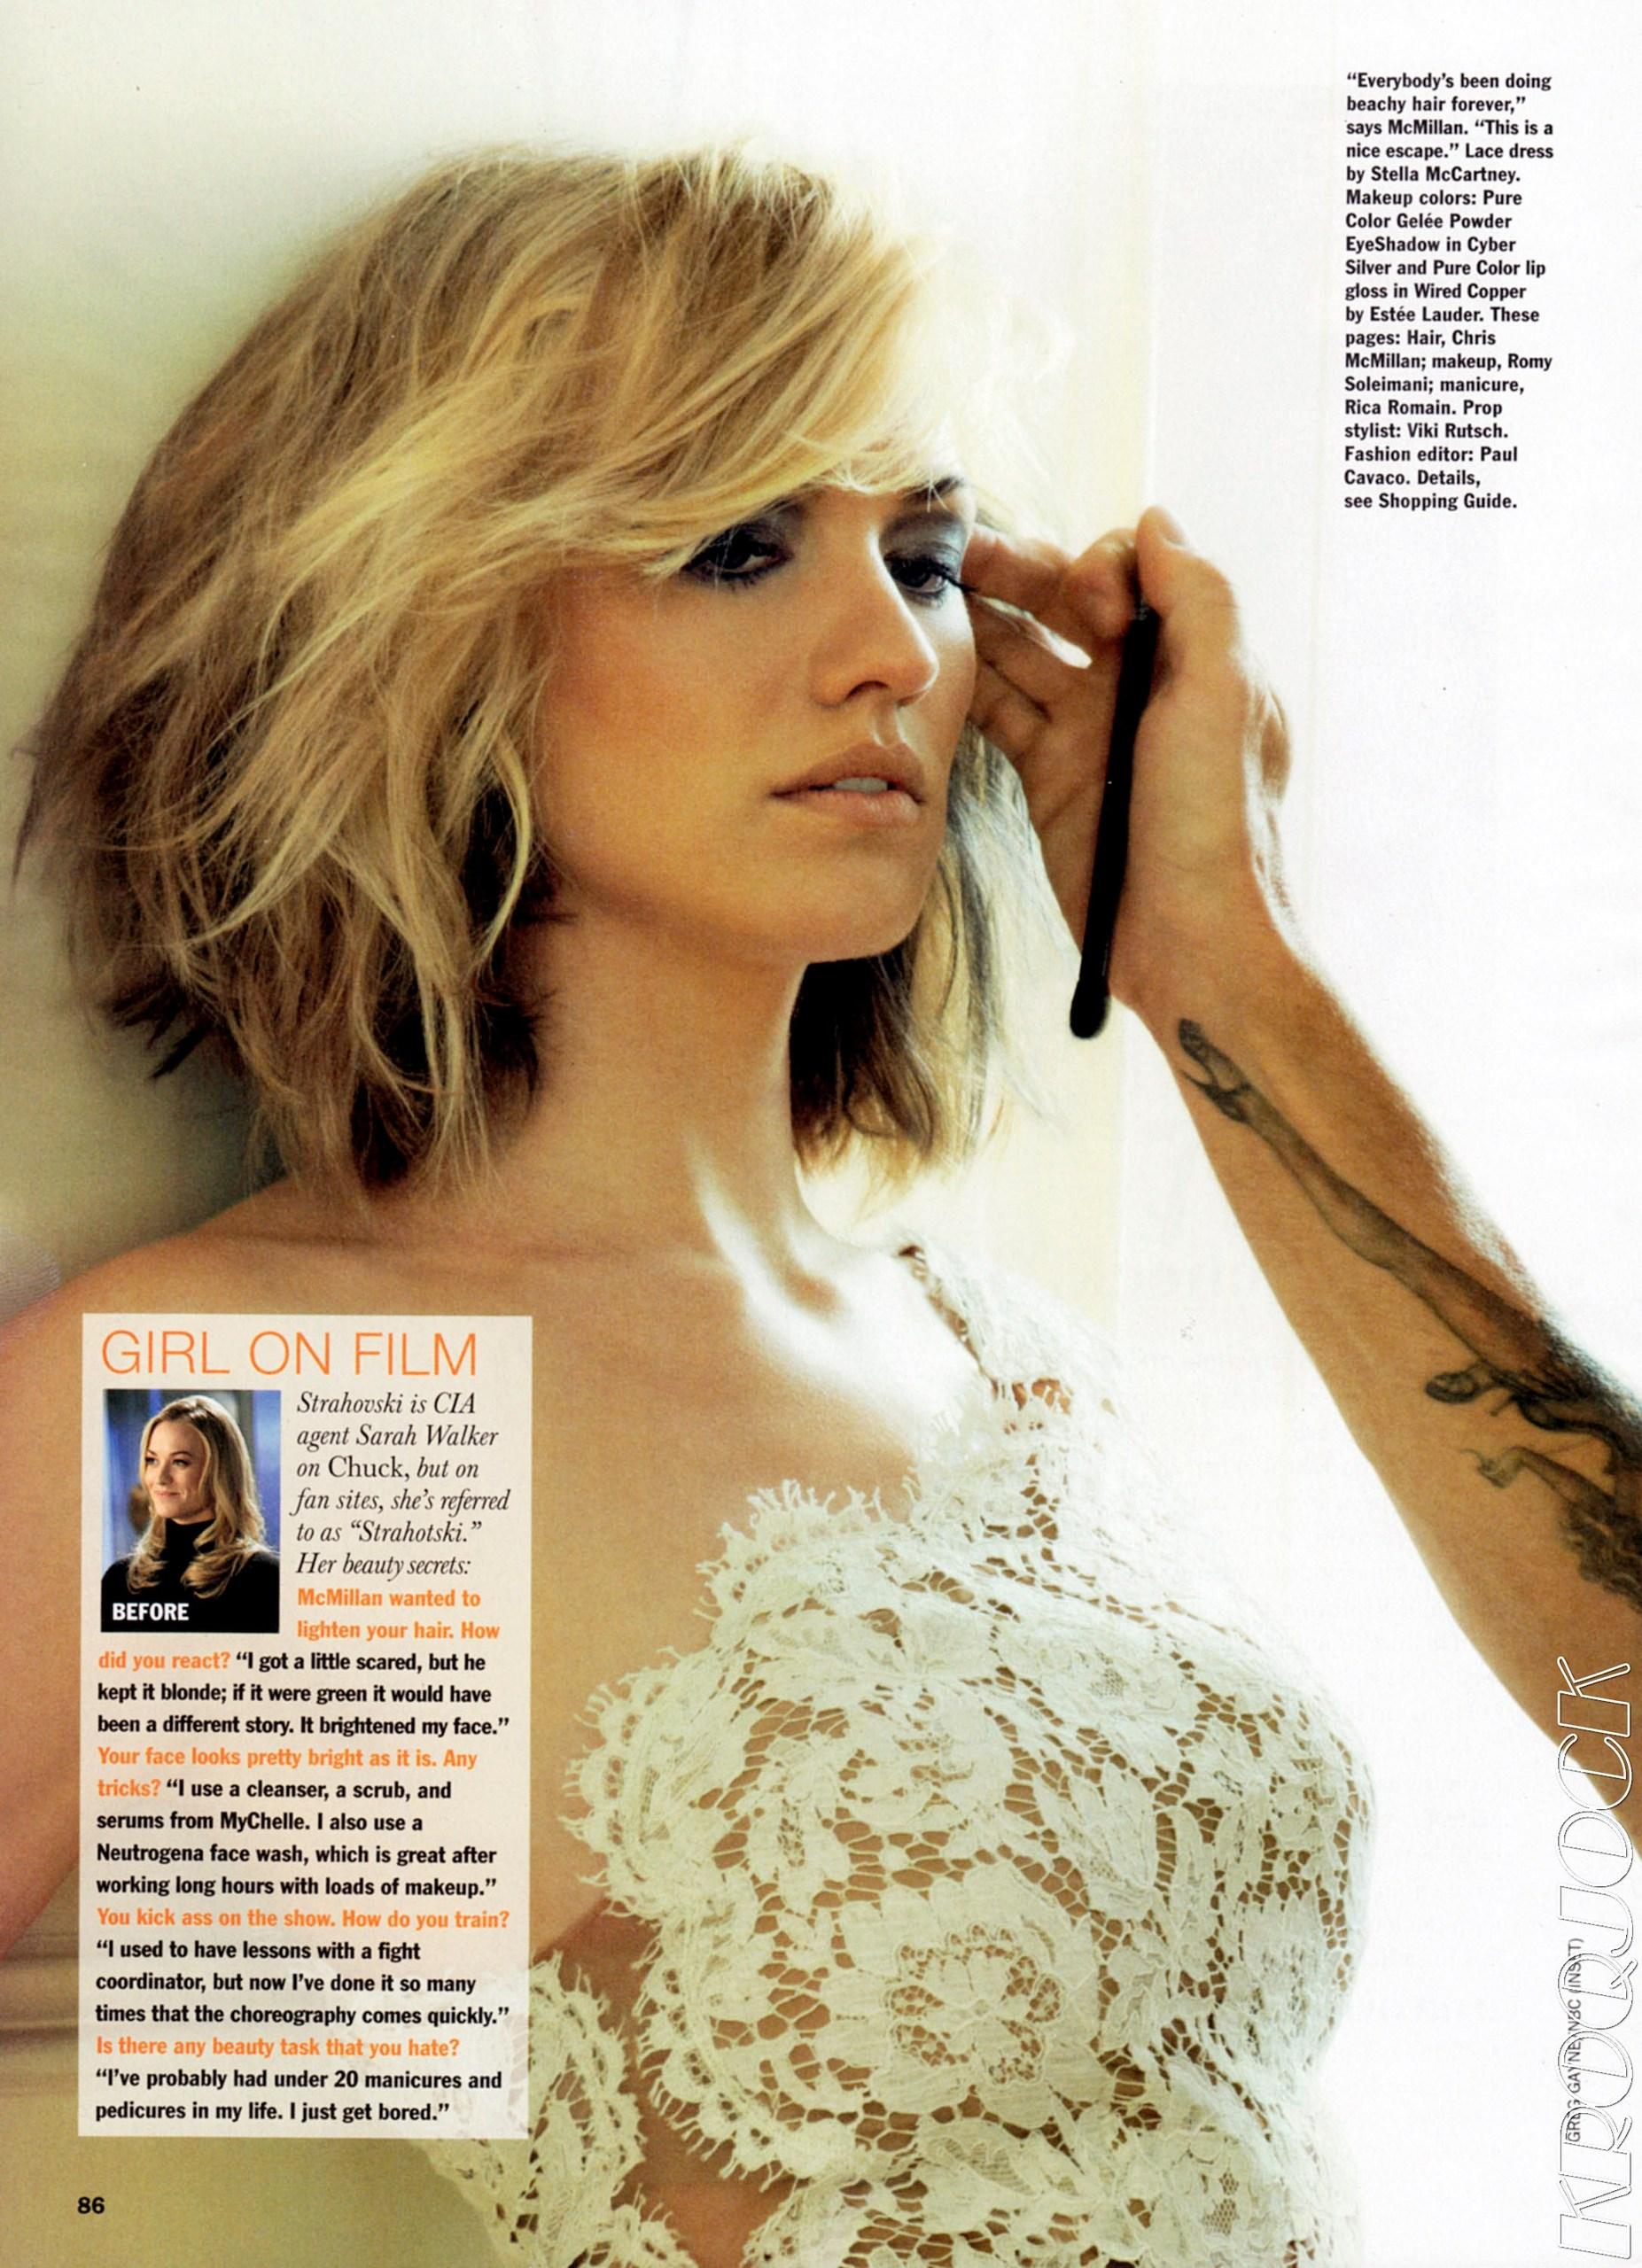 Yvonne Strahovski in the January 2012 Issue of Allure Magazine